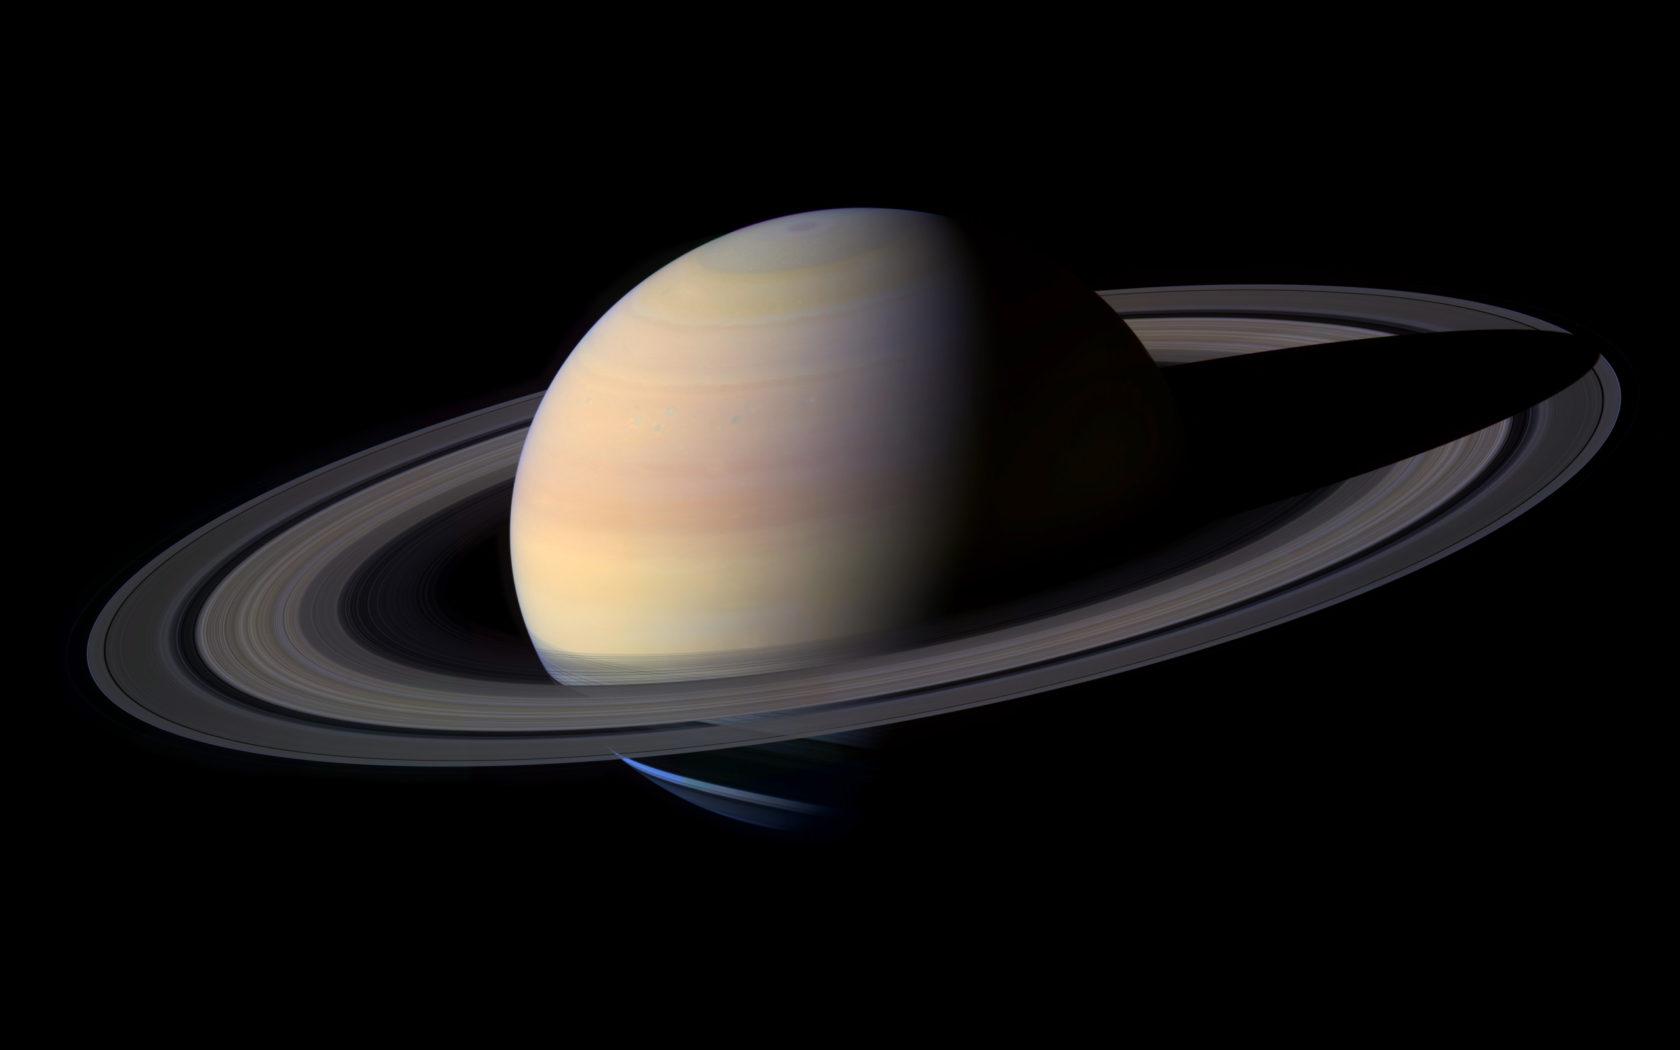 Futuristic Iphone X Wallpaper Saturn Planet With Rings Desktop Wallpaper Wallpapers13 Com